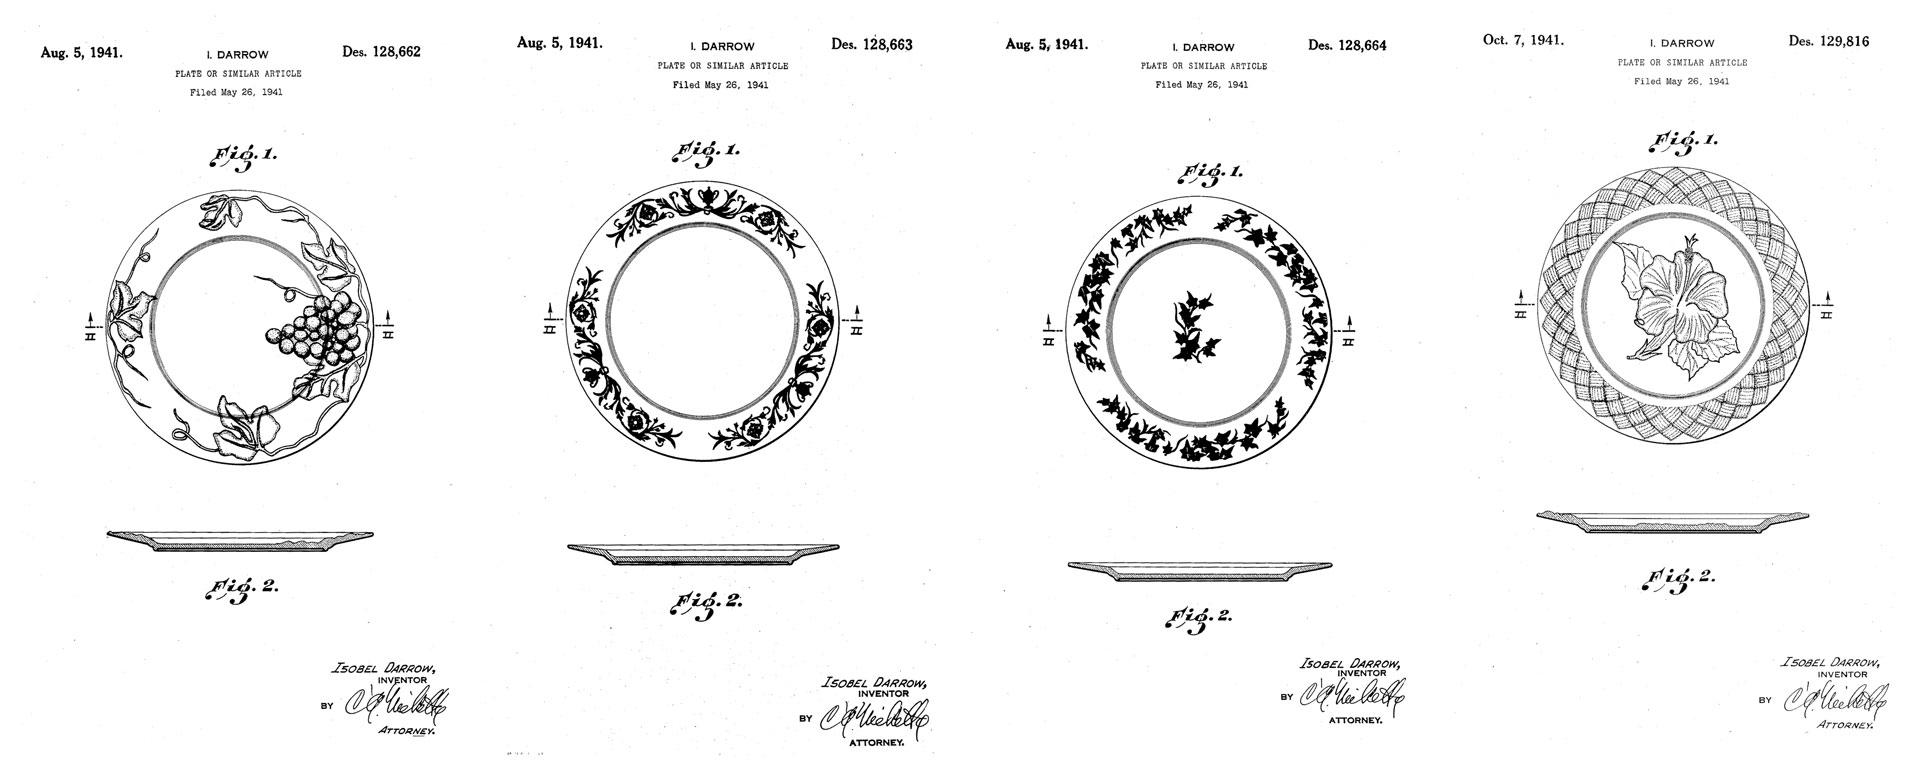 Pacific Pottery Isobel Darrow Patents